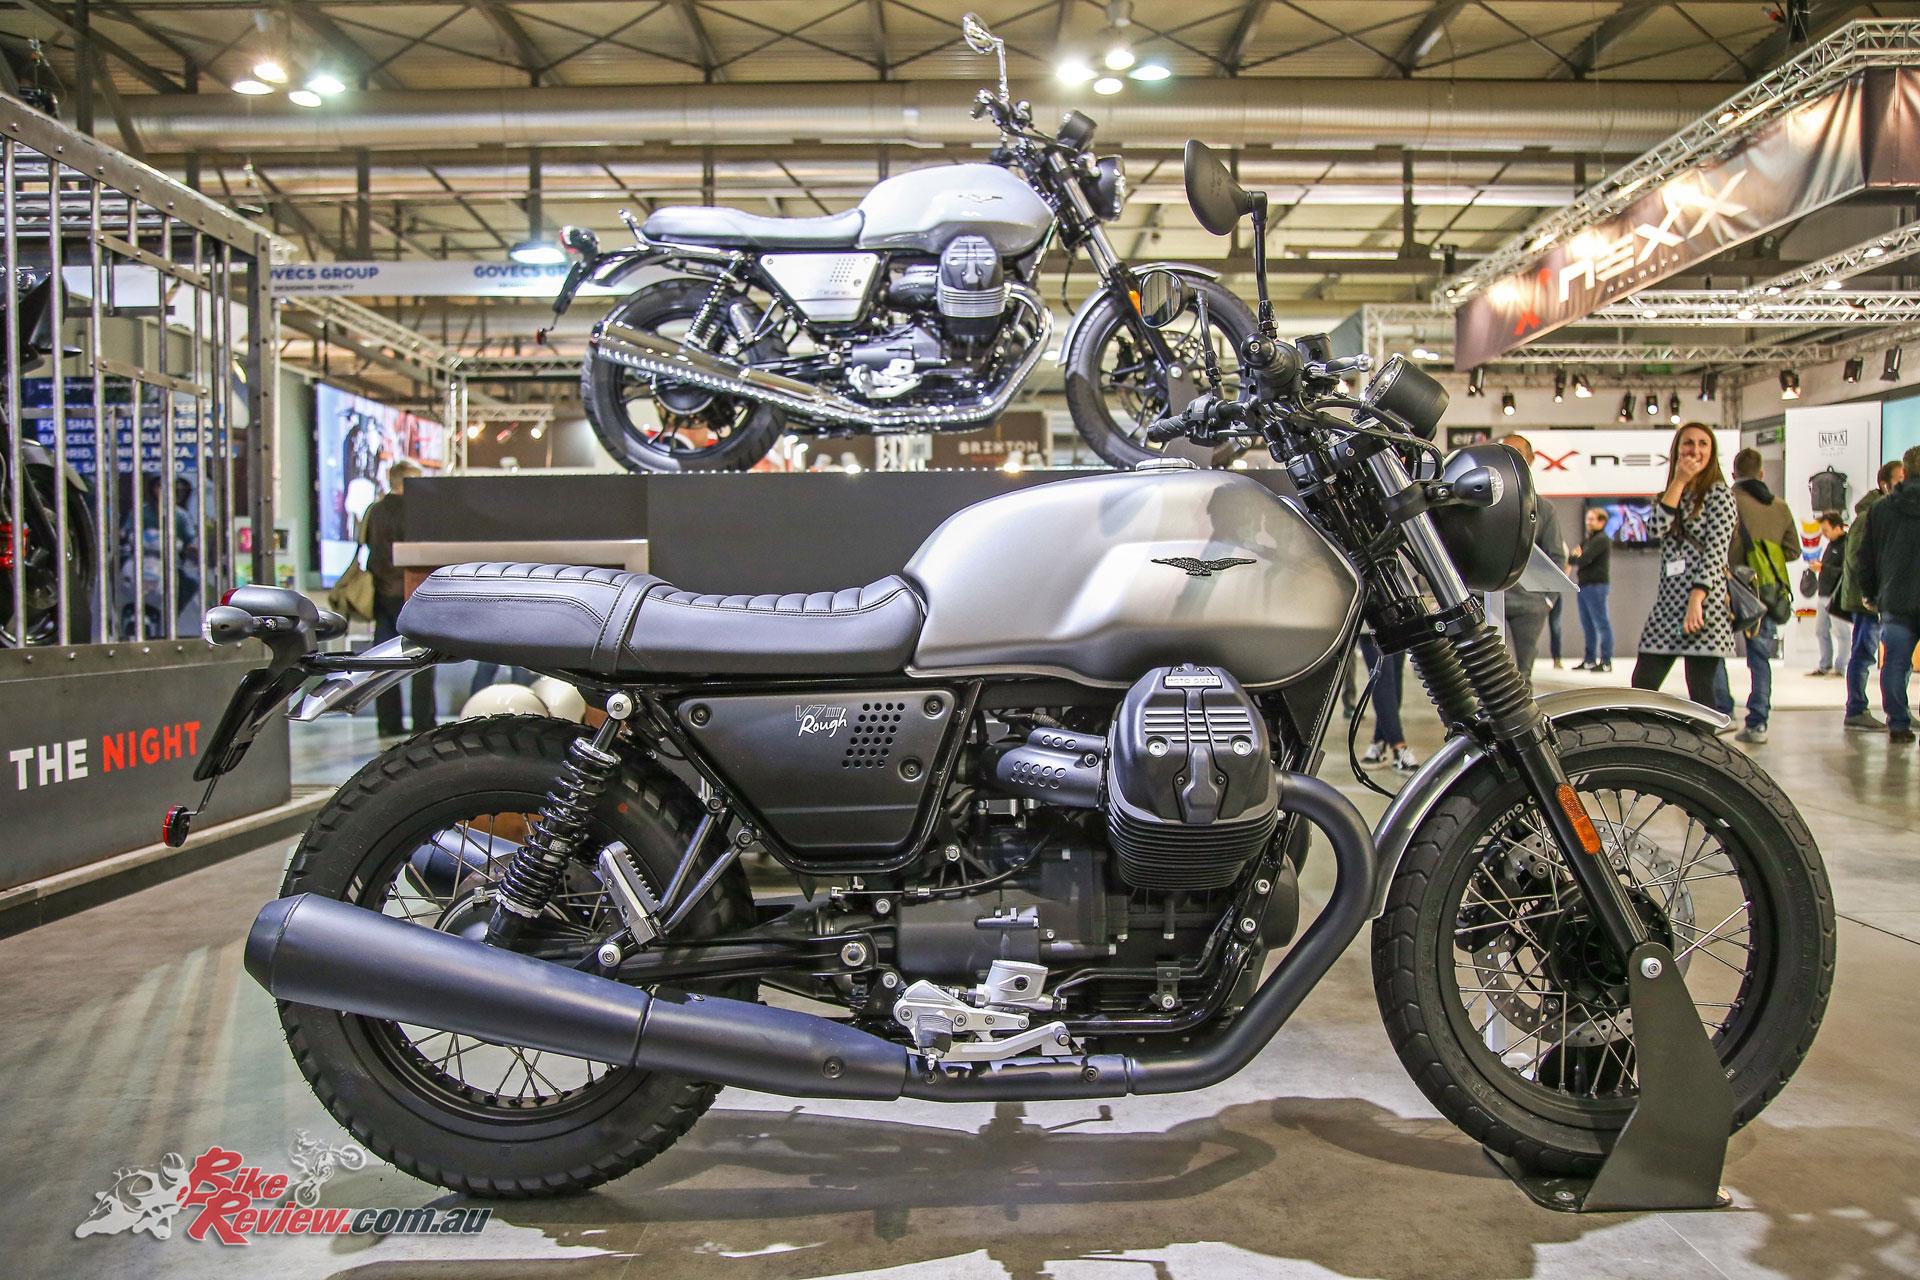 moto guzzi unveils updates for 2018 models bike review. Black Bedroom Furniture Sets. Home Design Ideas